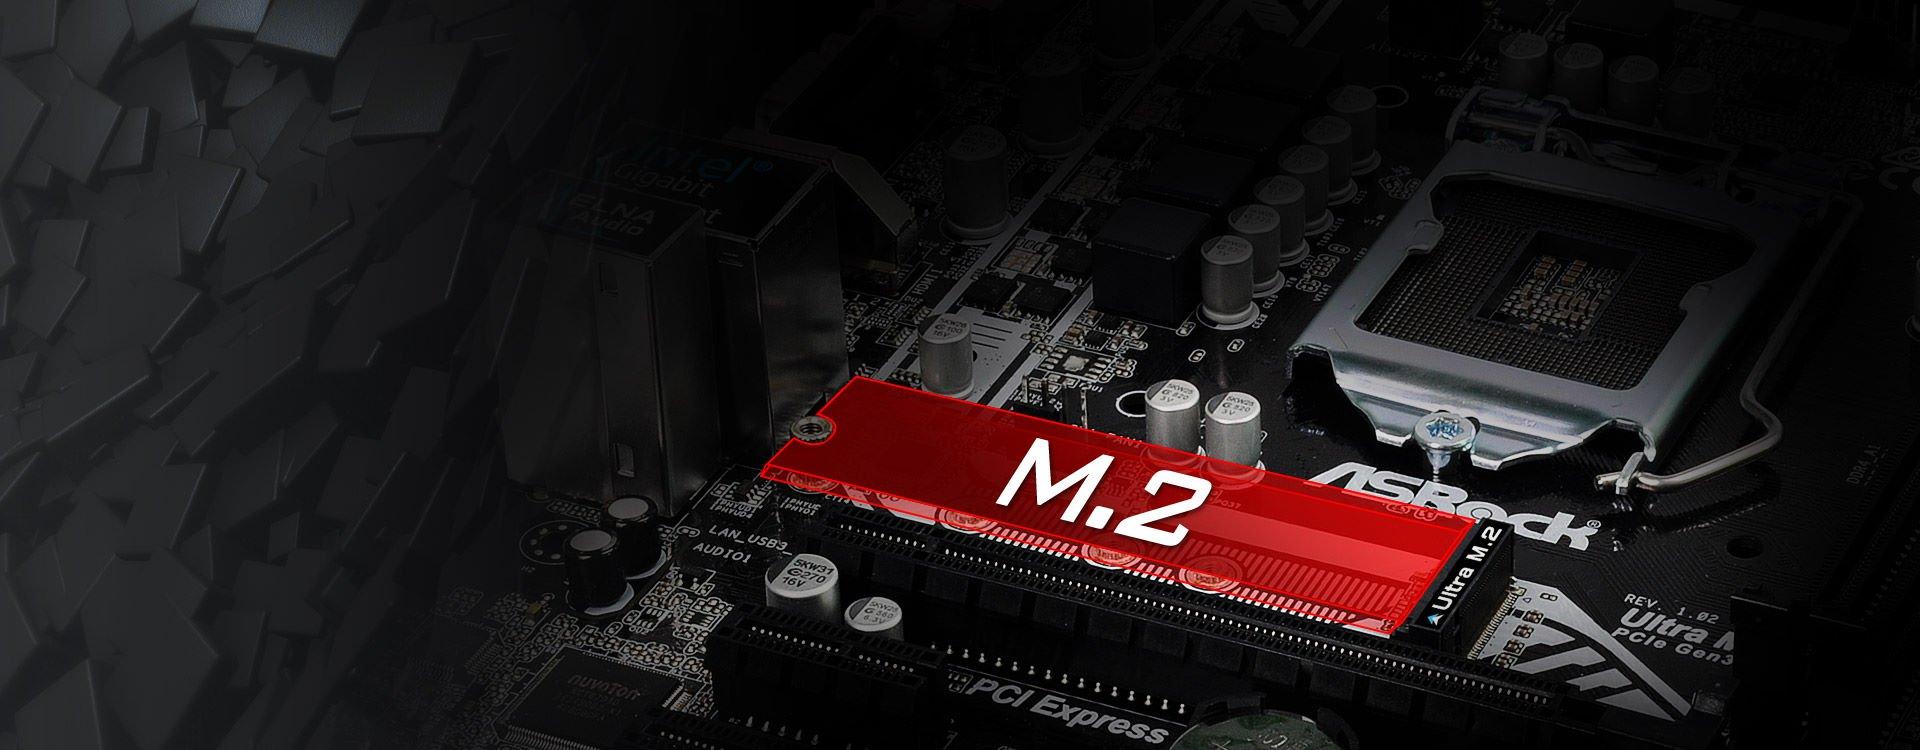 hight resolution of ultra m 2 32 gb s pcie gen3 x4 sata3